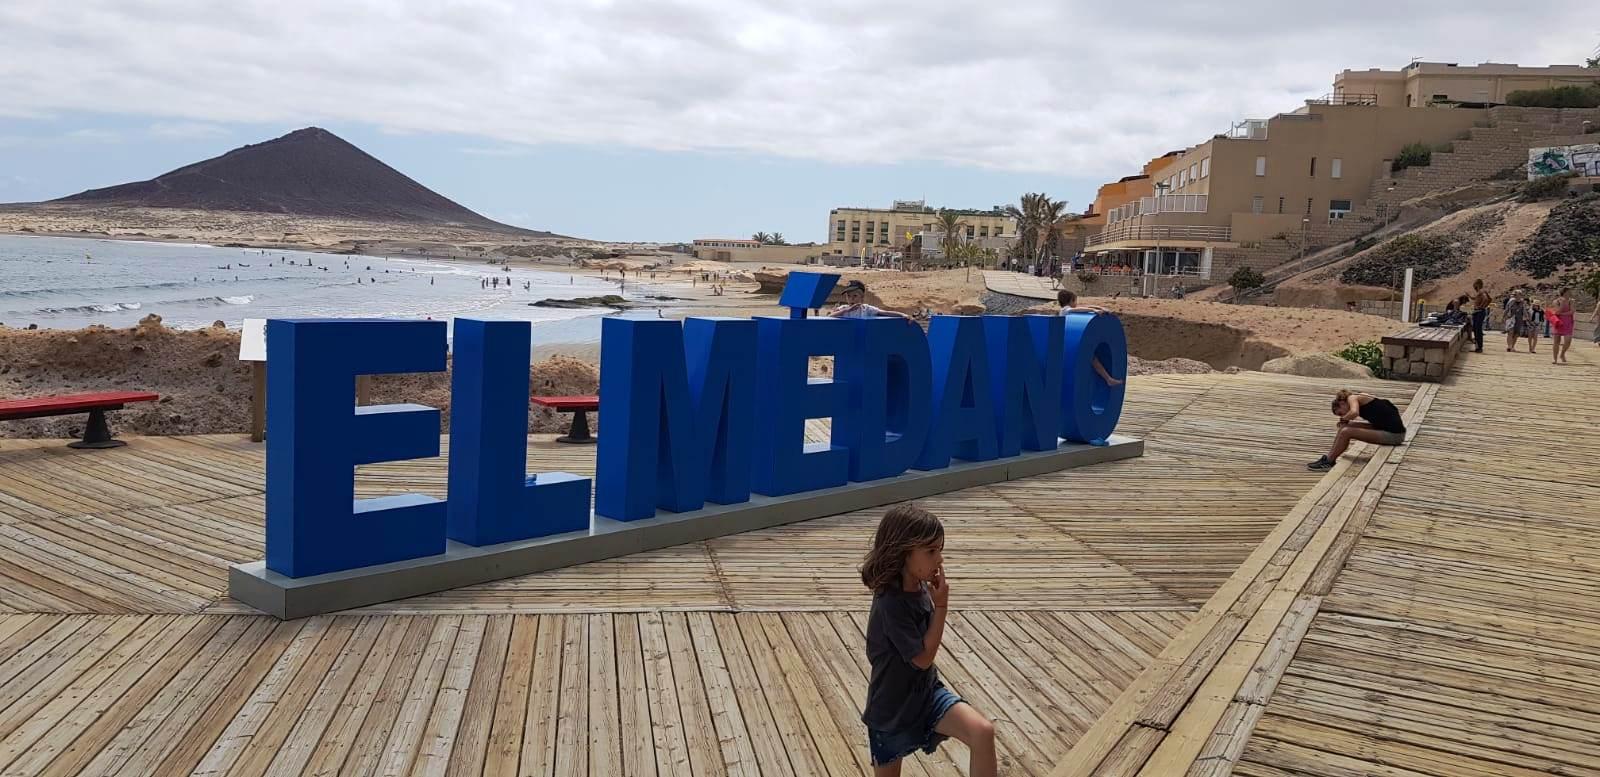 Plaja El Medano, Tenerife - vacantele turistilor - ANCAPAVEL.RO